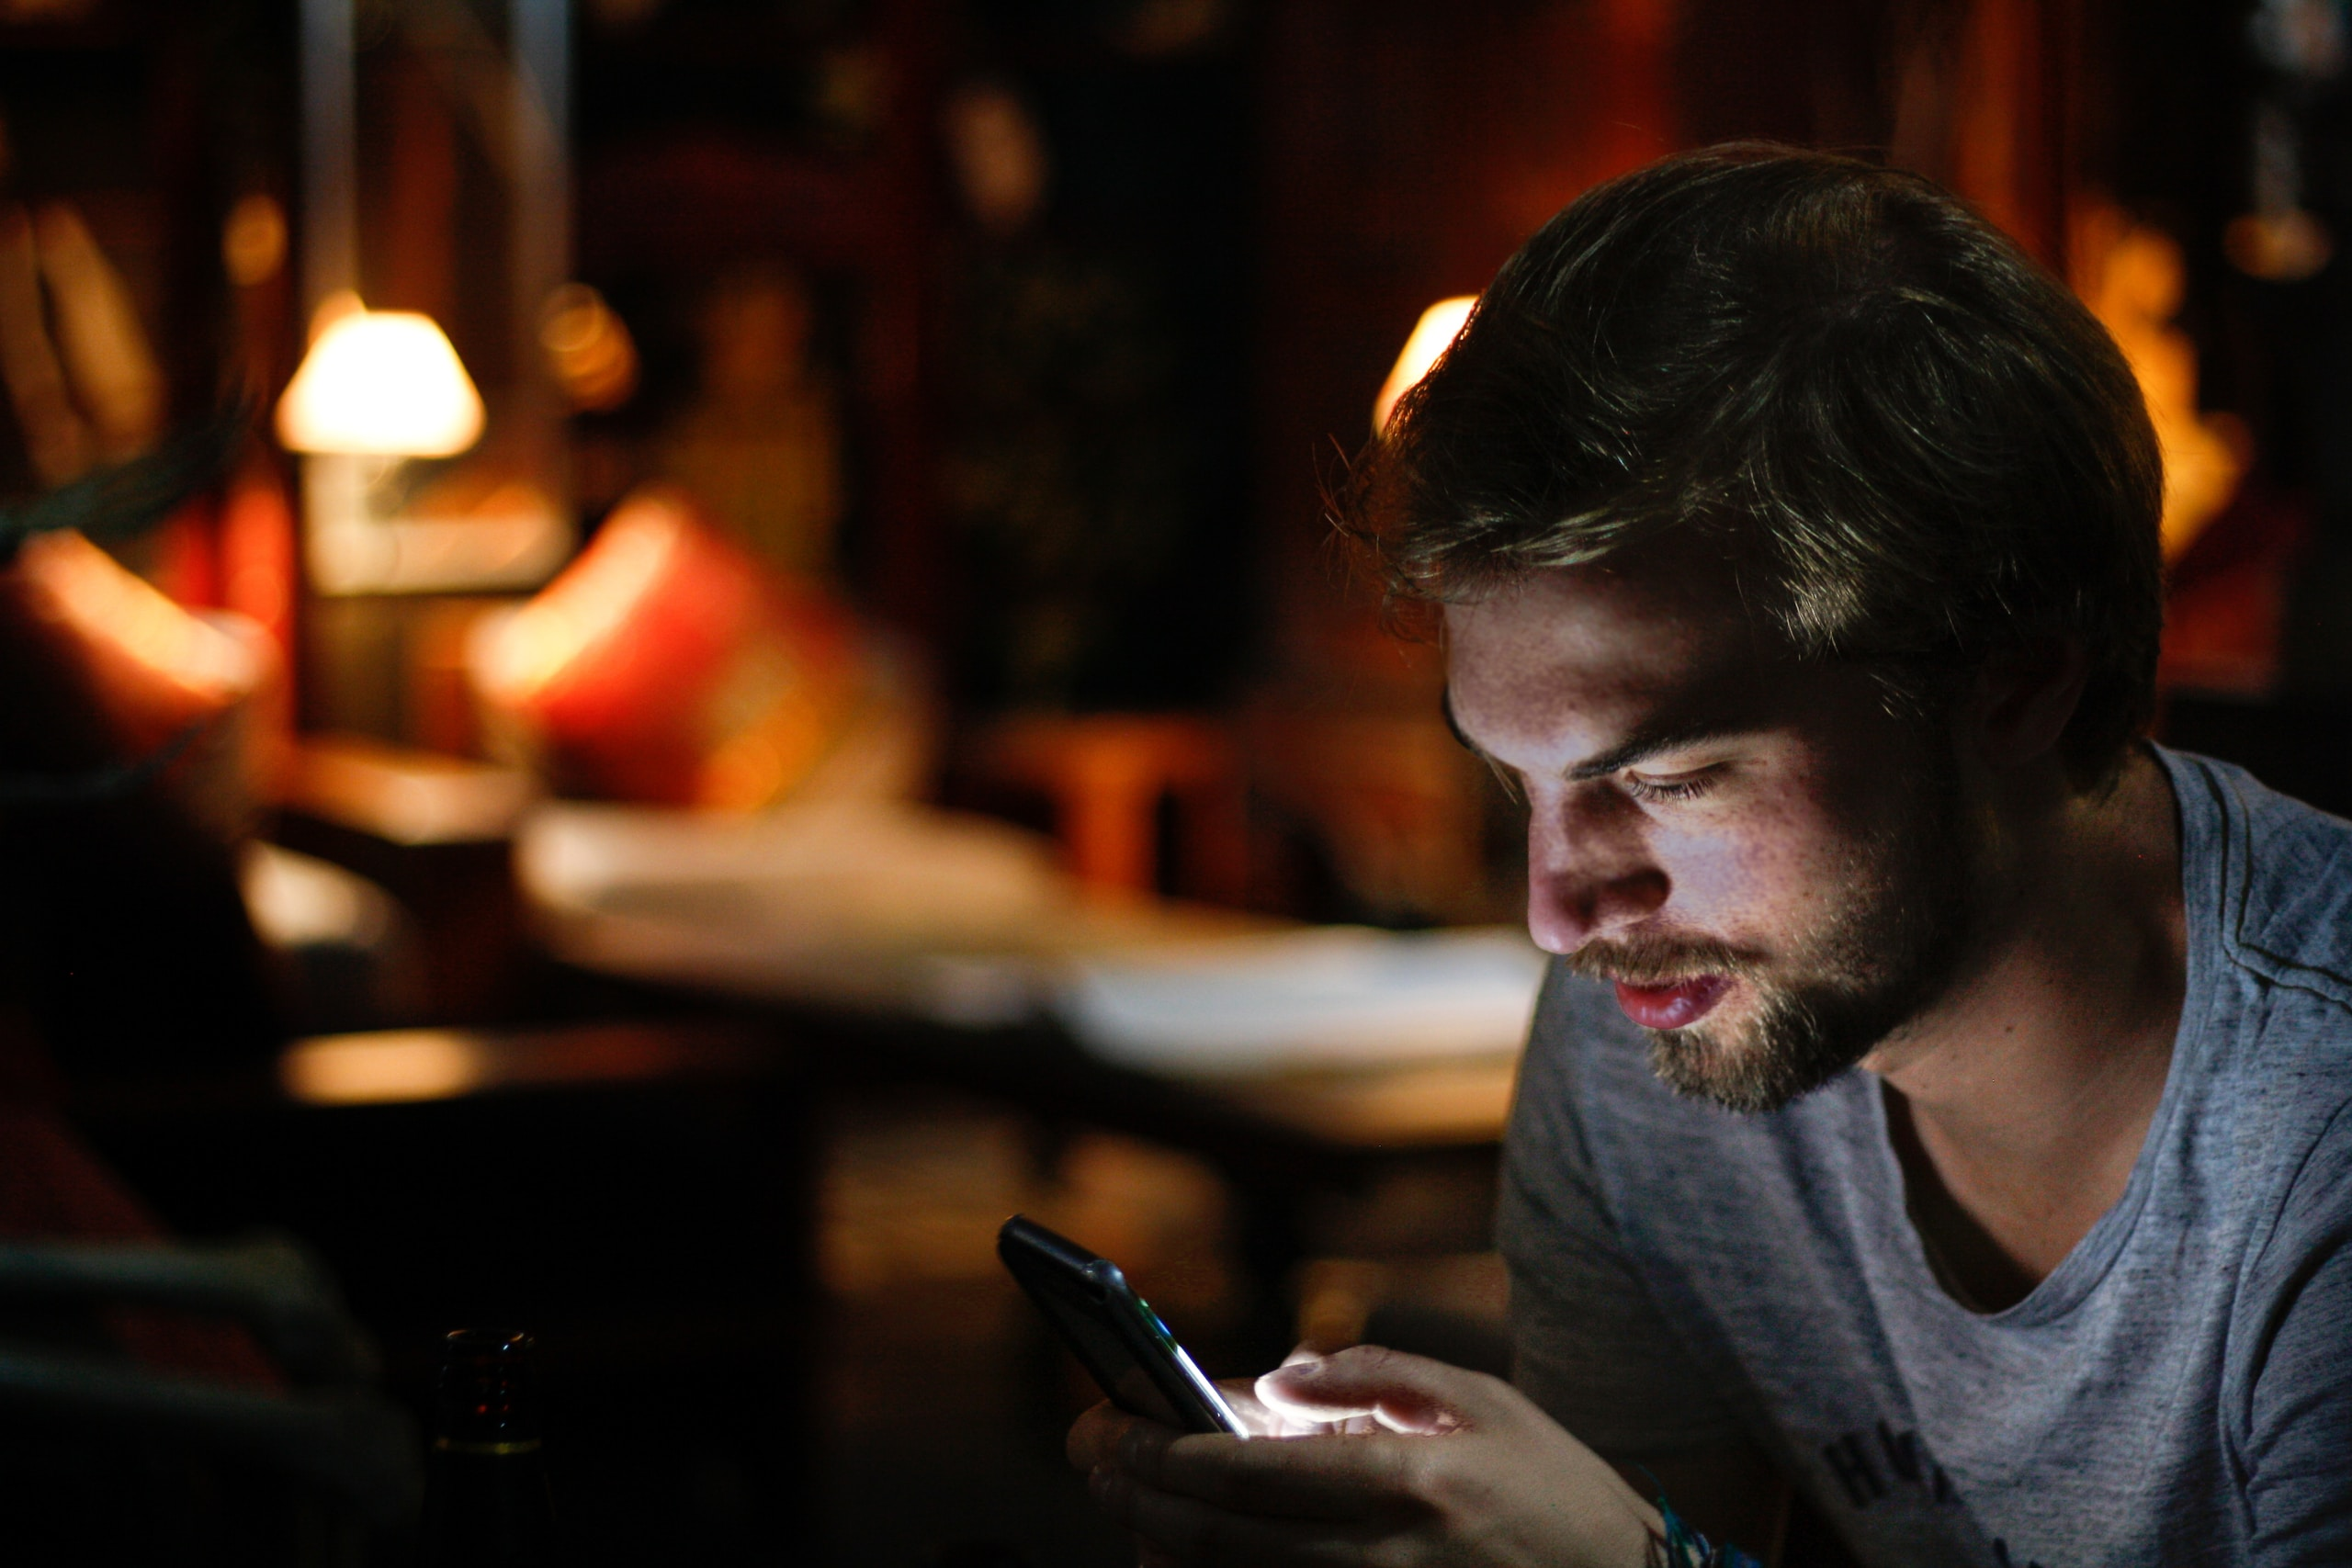 millennial usando un smartphone